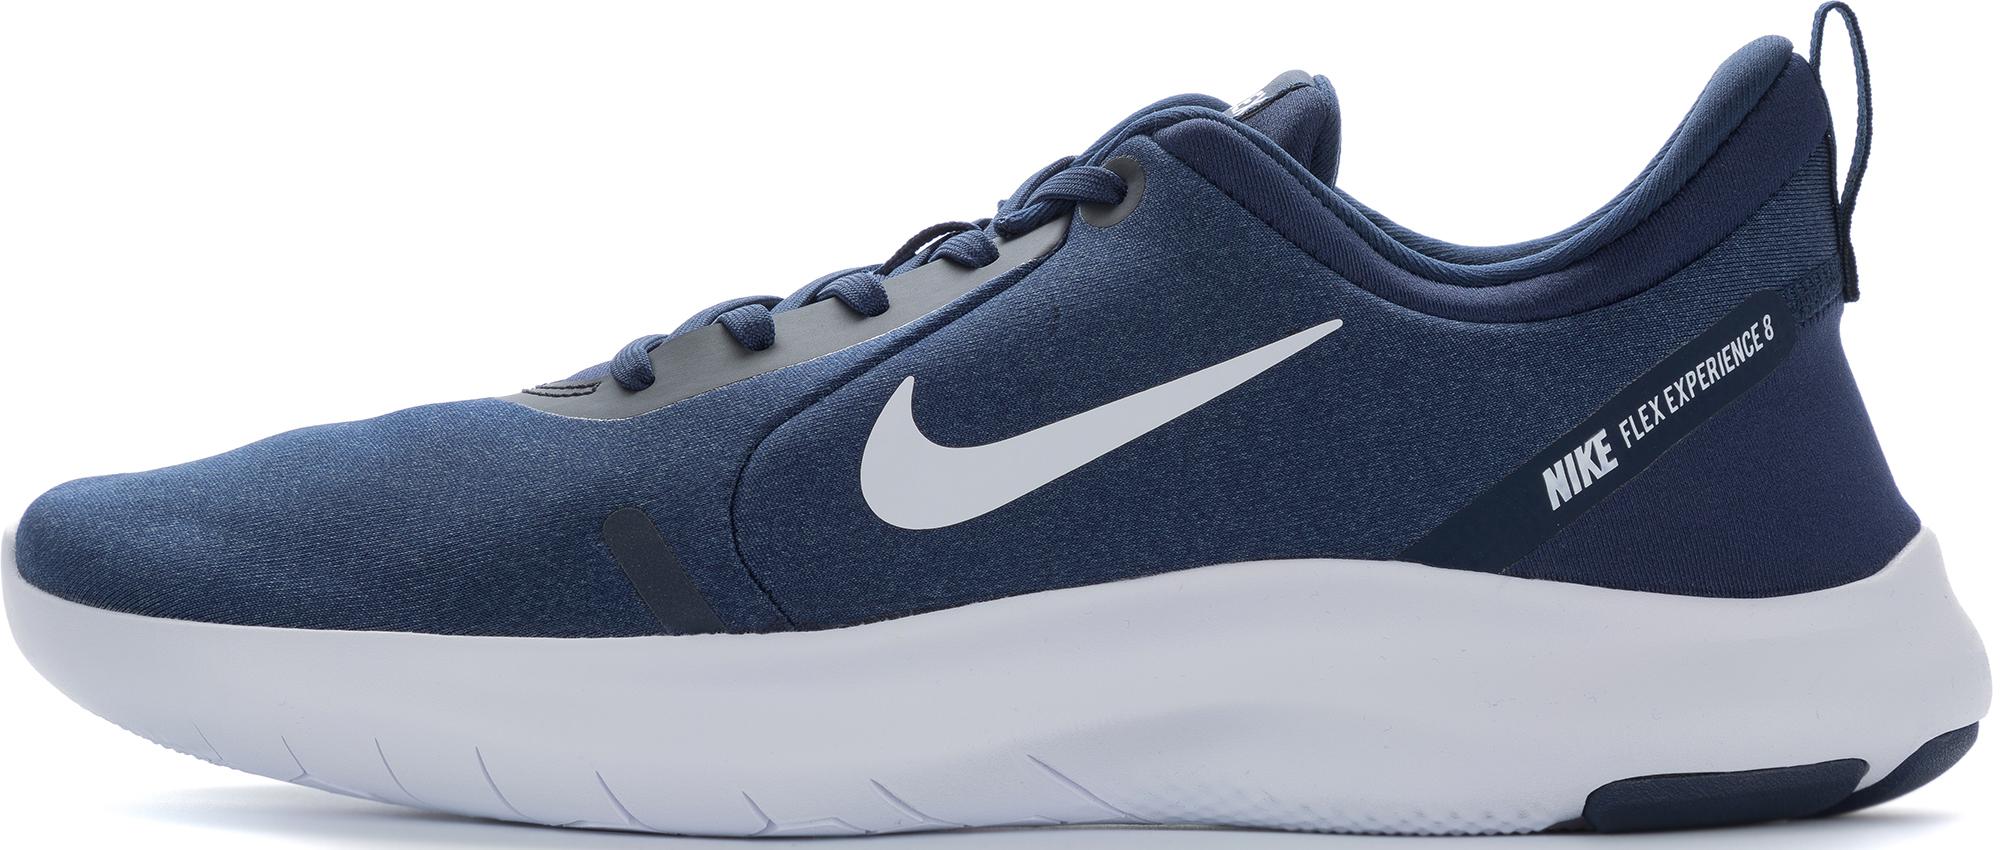 Nike Кроссовки мужские Nike Flex Experience, размер 46,5